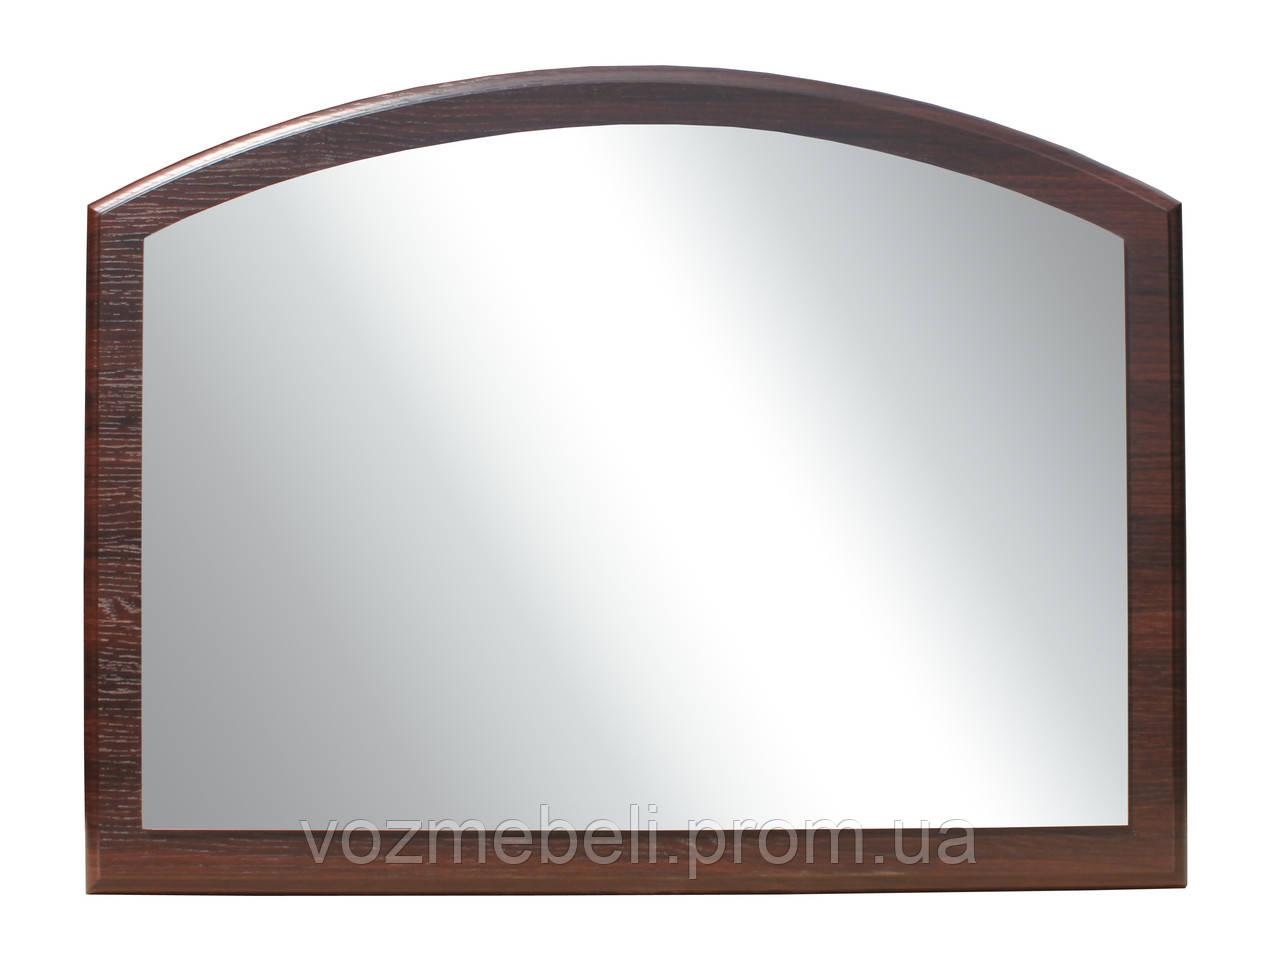 Зеркало С001 /Неман/